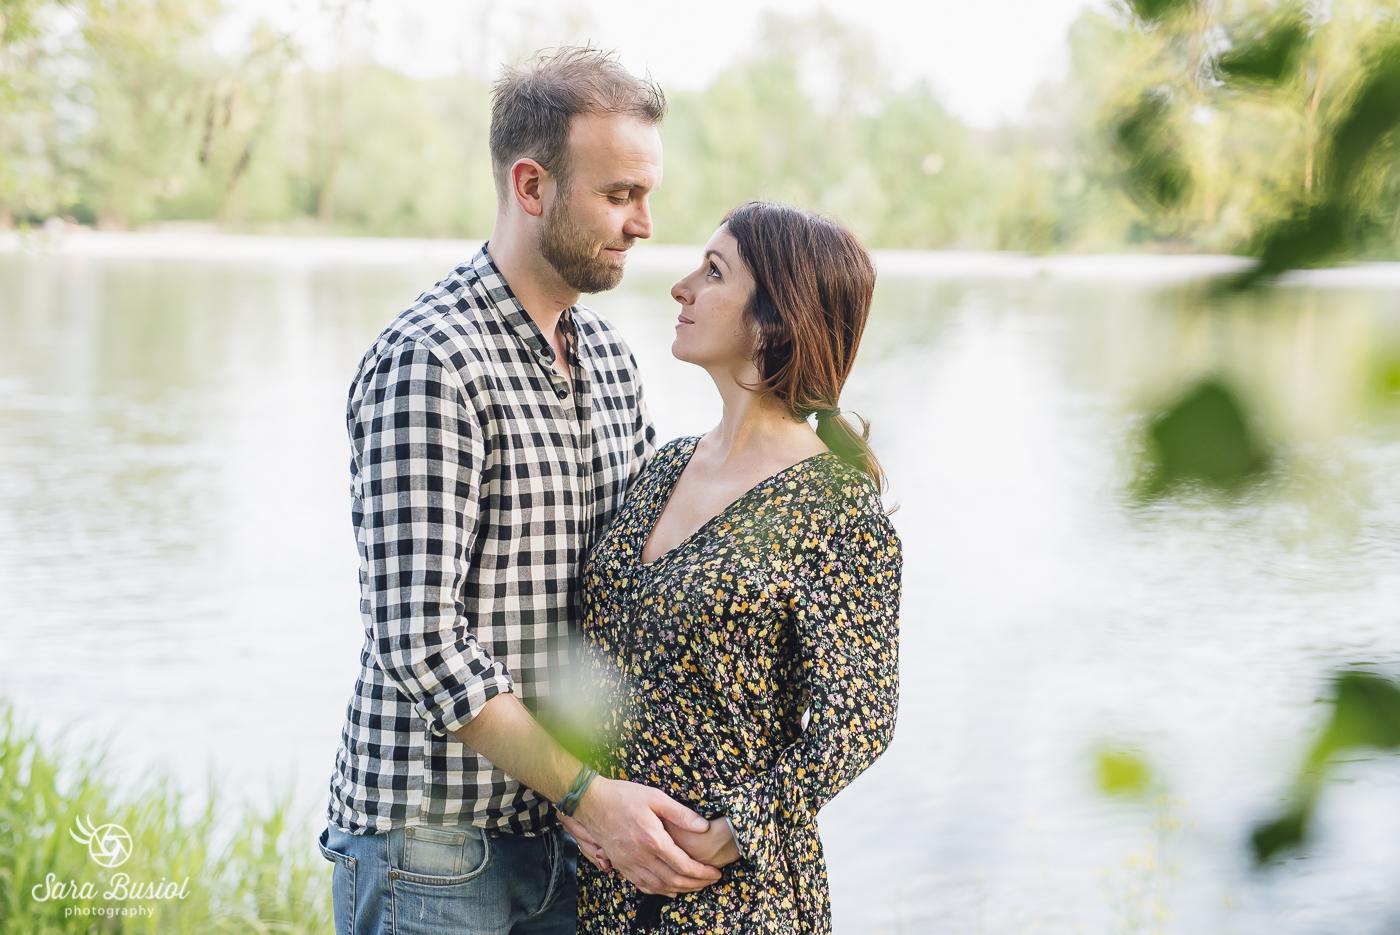 Letizia&Luca-engagment 100